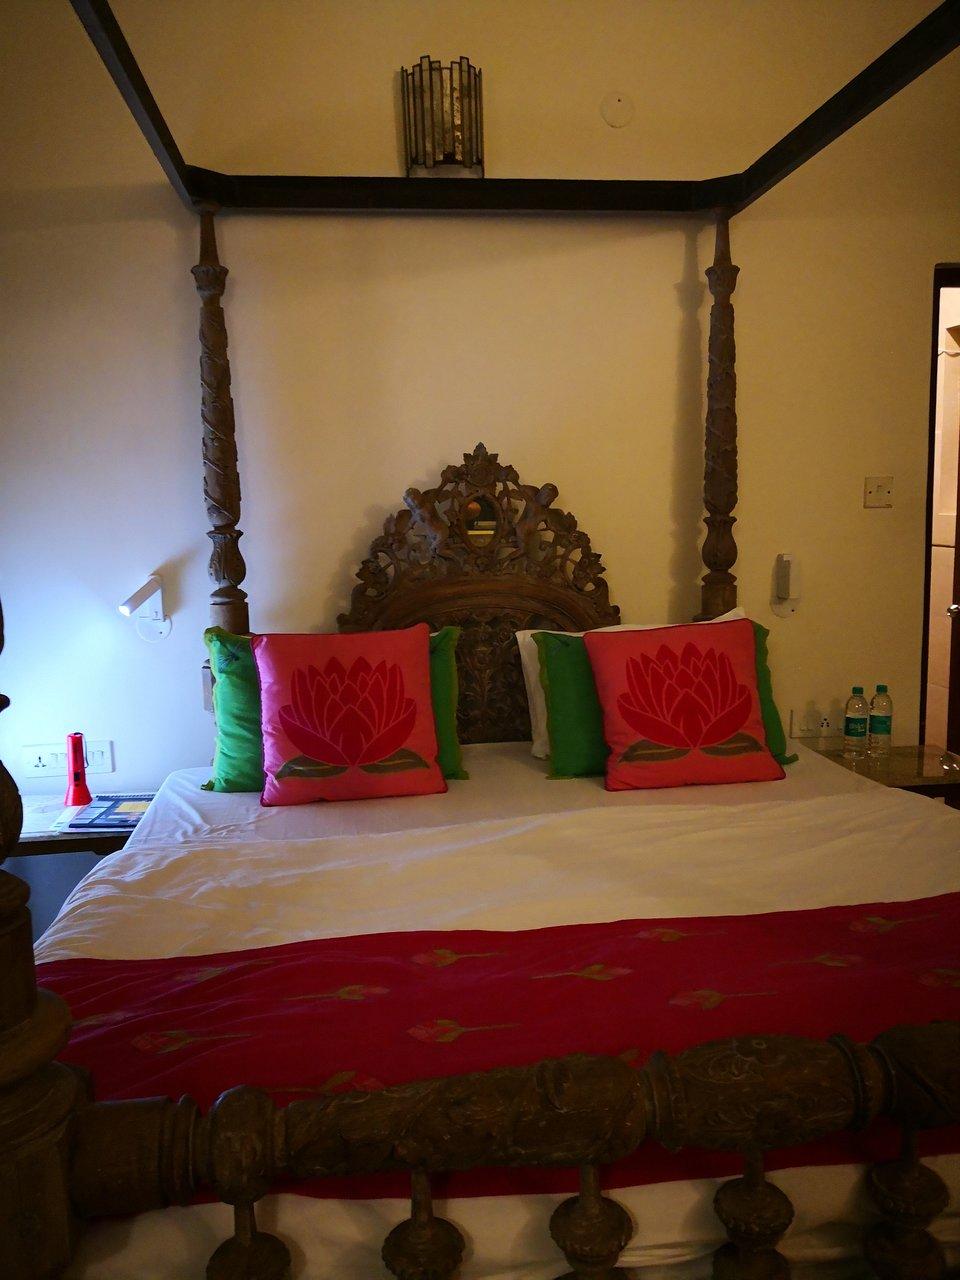 Marvelous THE IVY HOUSE   Updated 2018 Room Prices U0026 Bu0026B Reviews (India/Kolkata  (Calcutta), Asia)   TripAdvisor